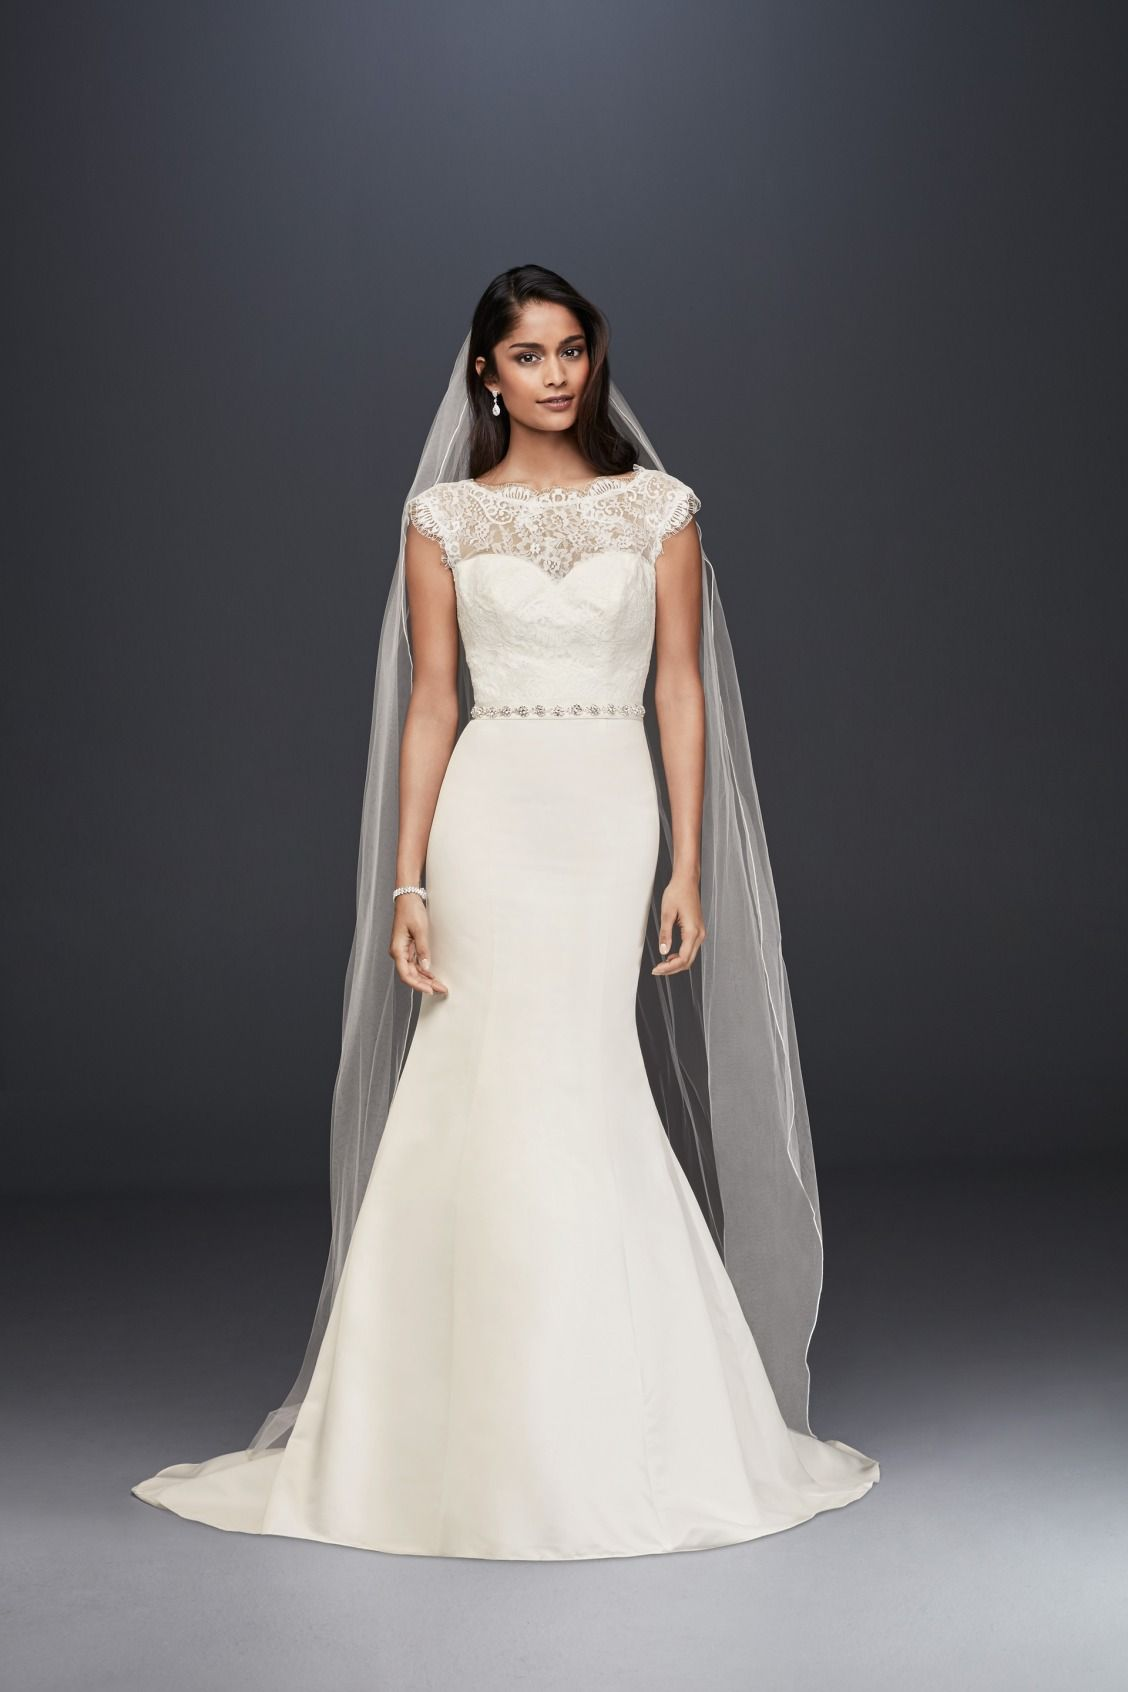 Pippa middleton inspired wedding dress from davidus bridal